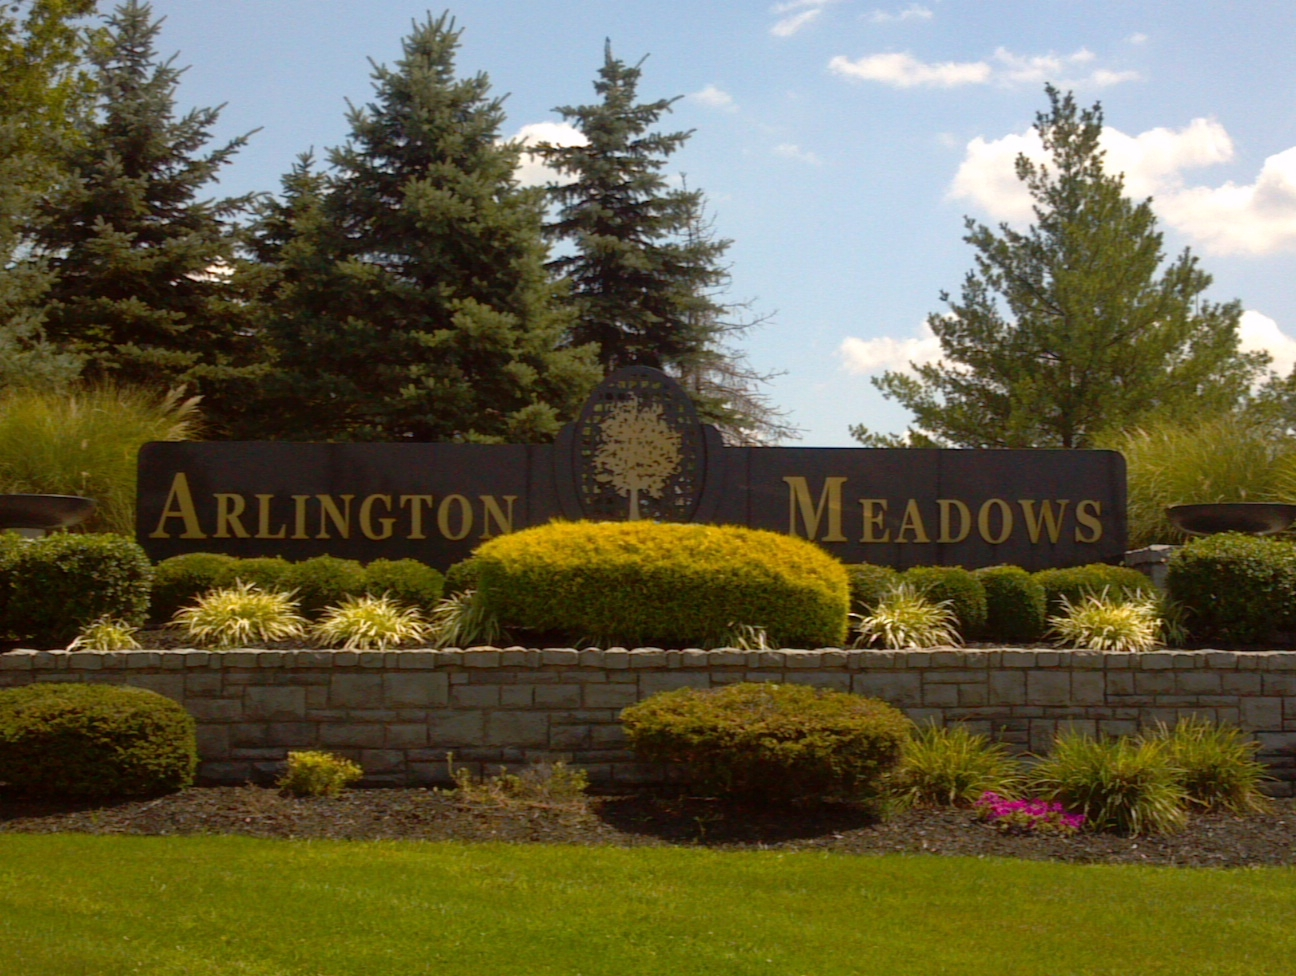 Arlington Meadows